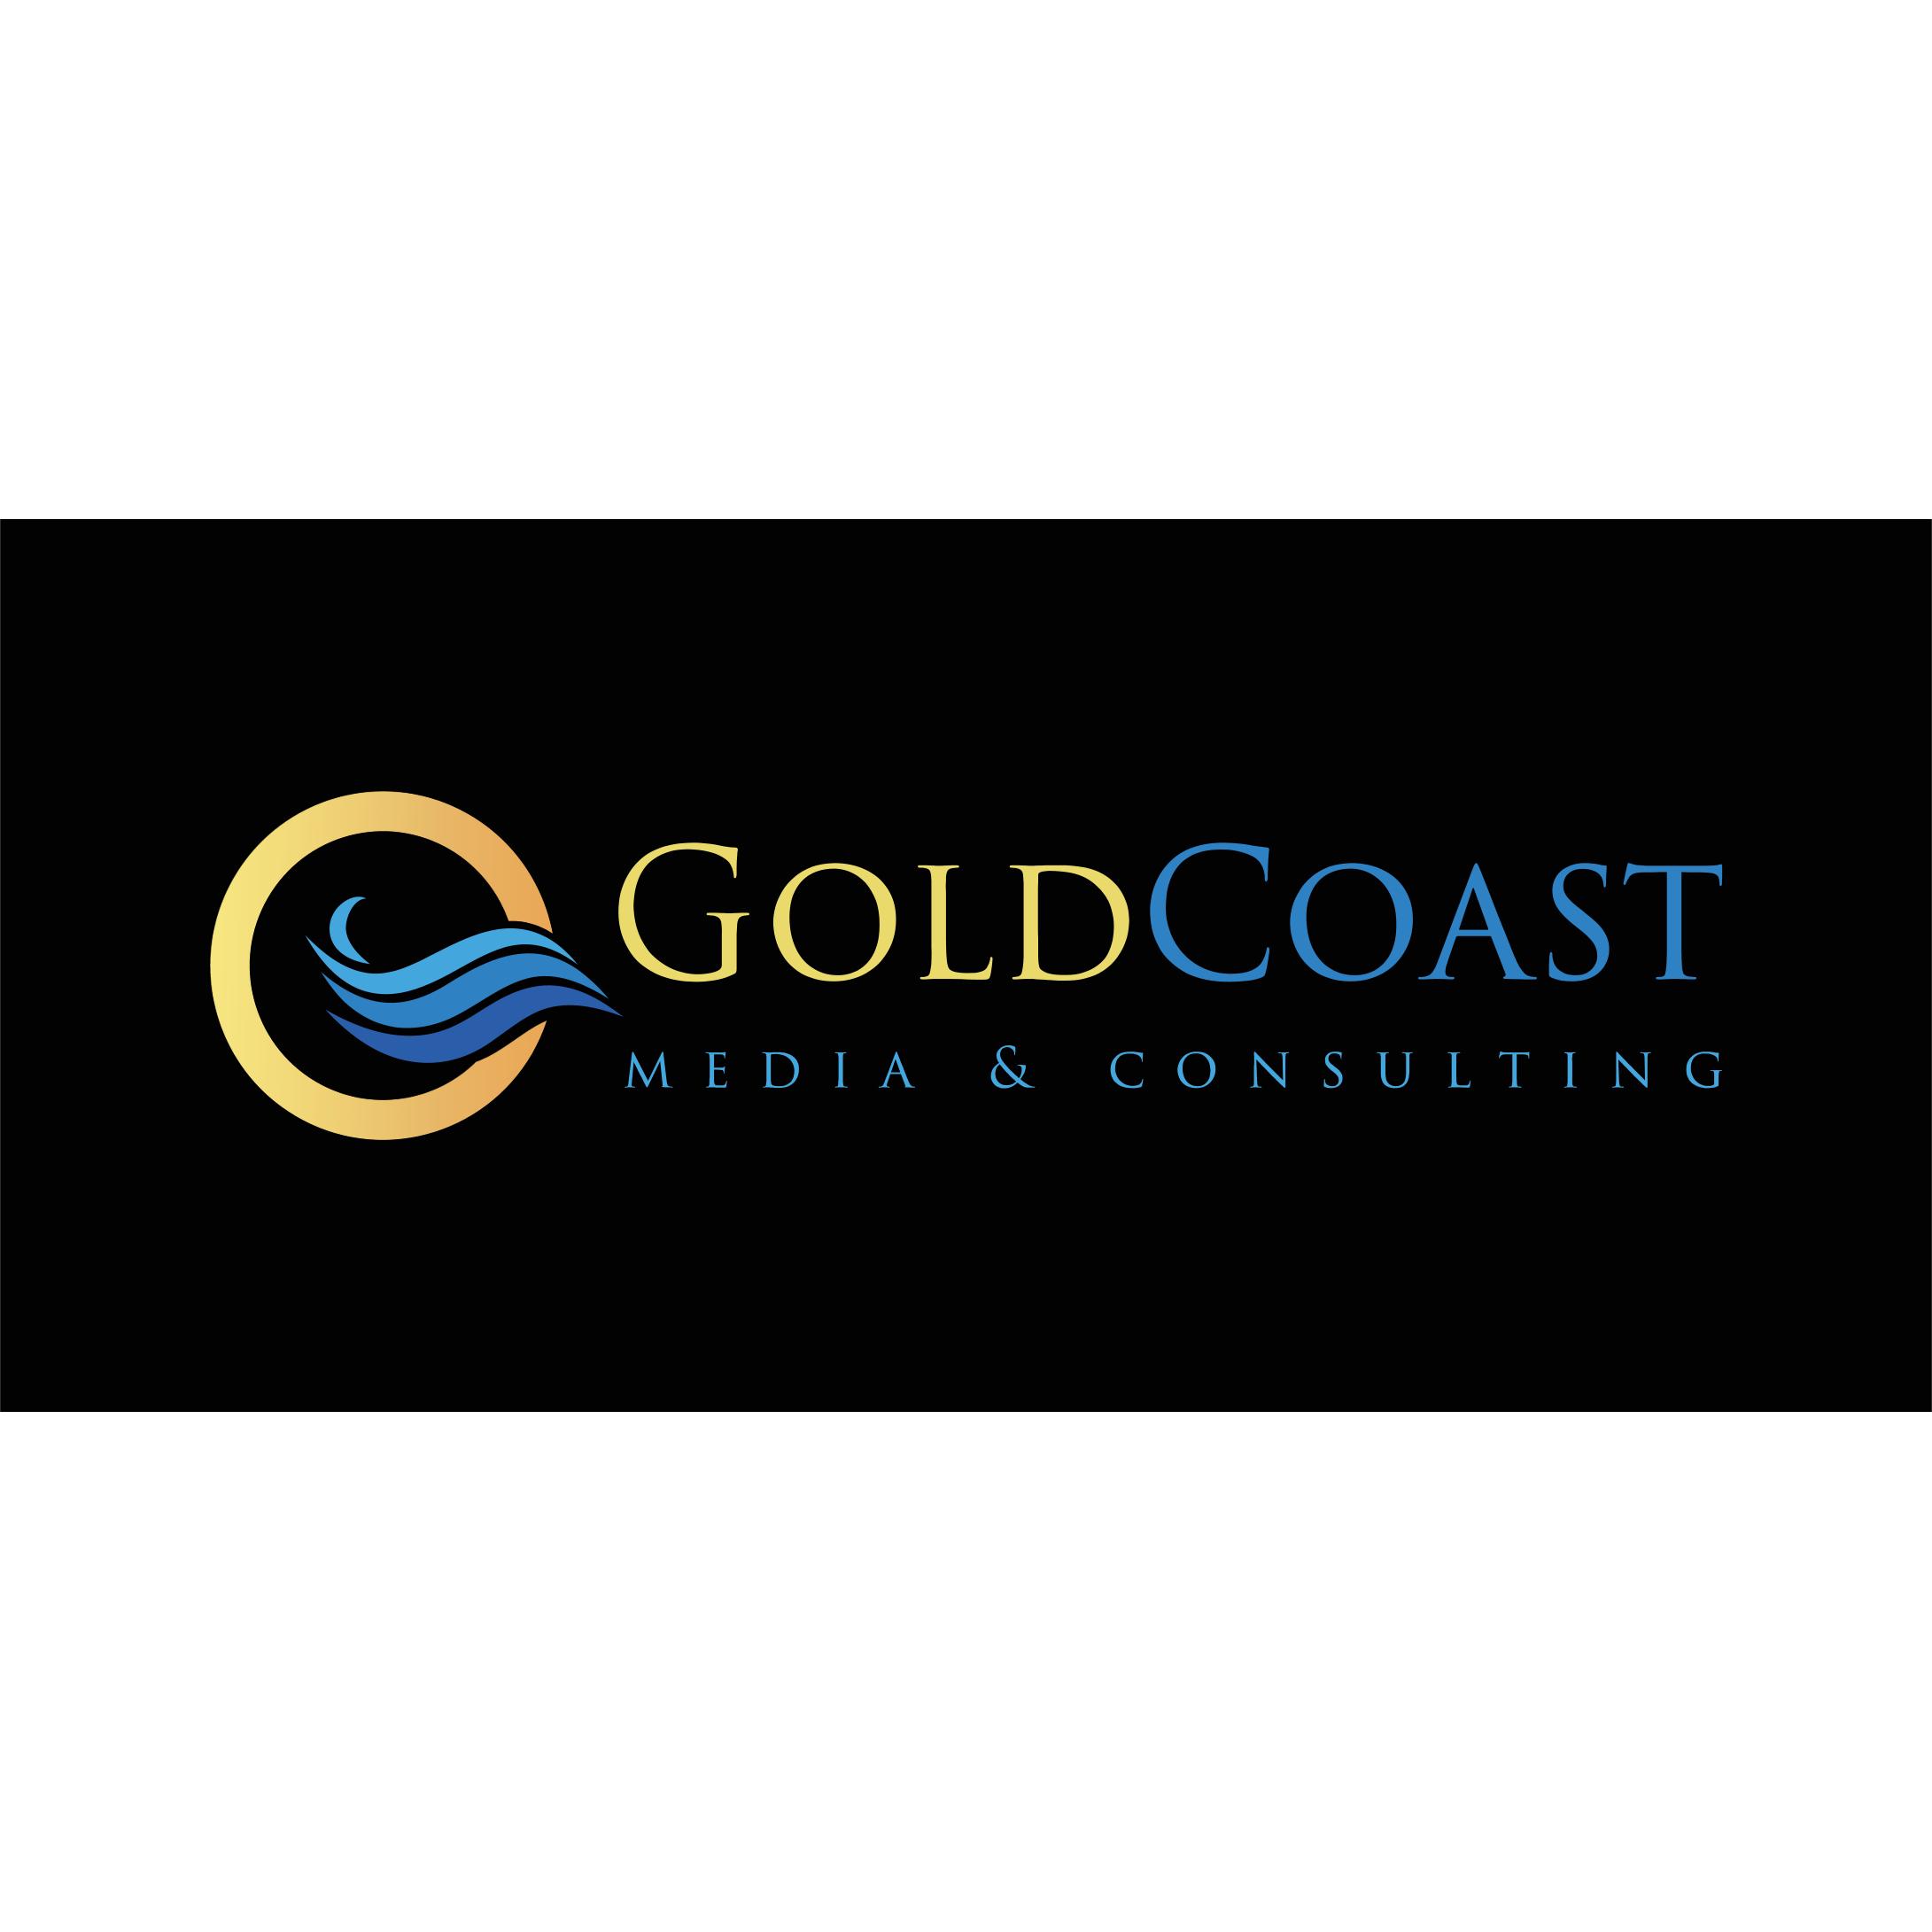 Gold Coast Media & Consulting